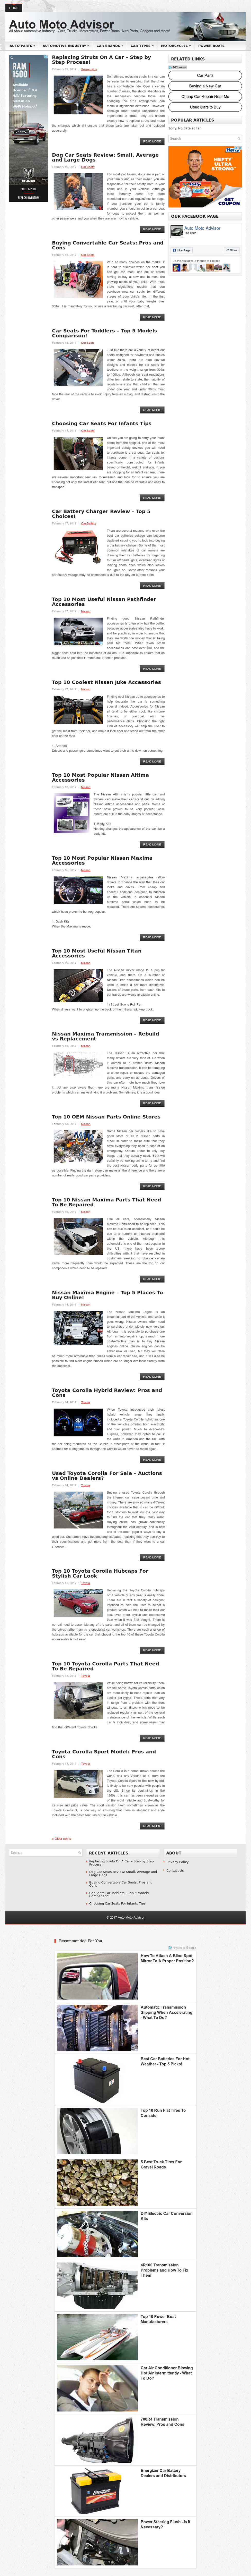 Auto Moto Advisor Competitors, Revenue and Employees - Owler